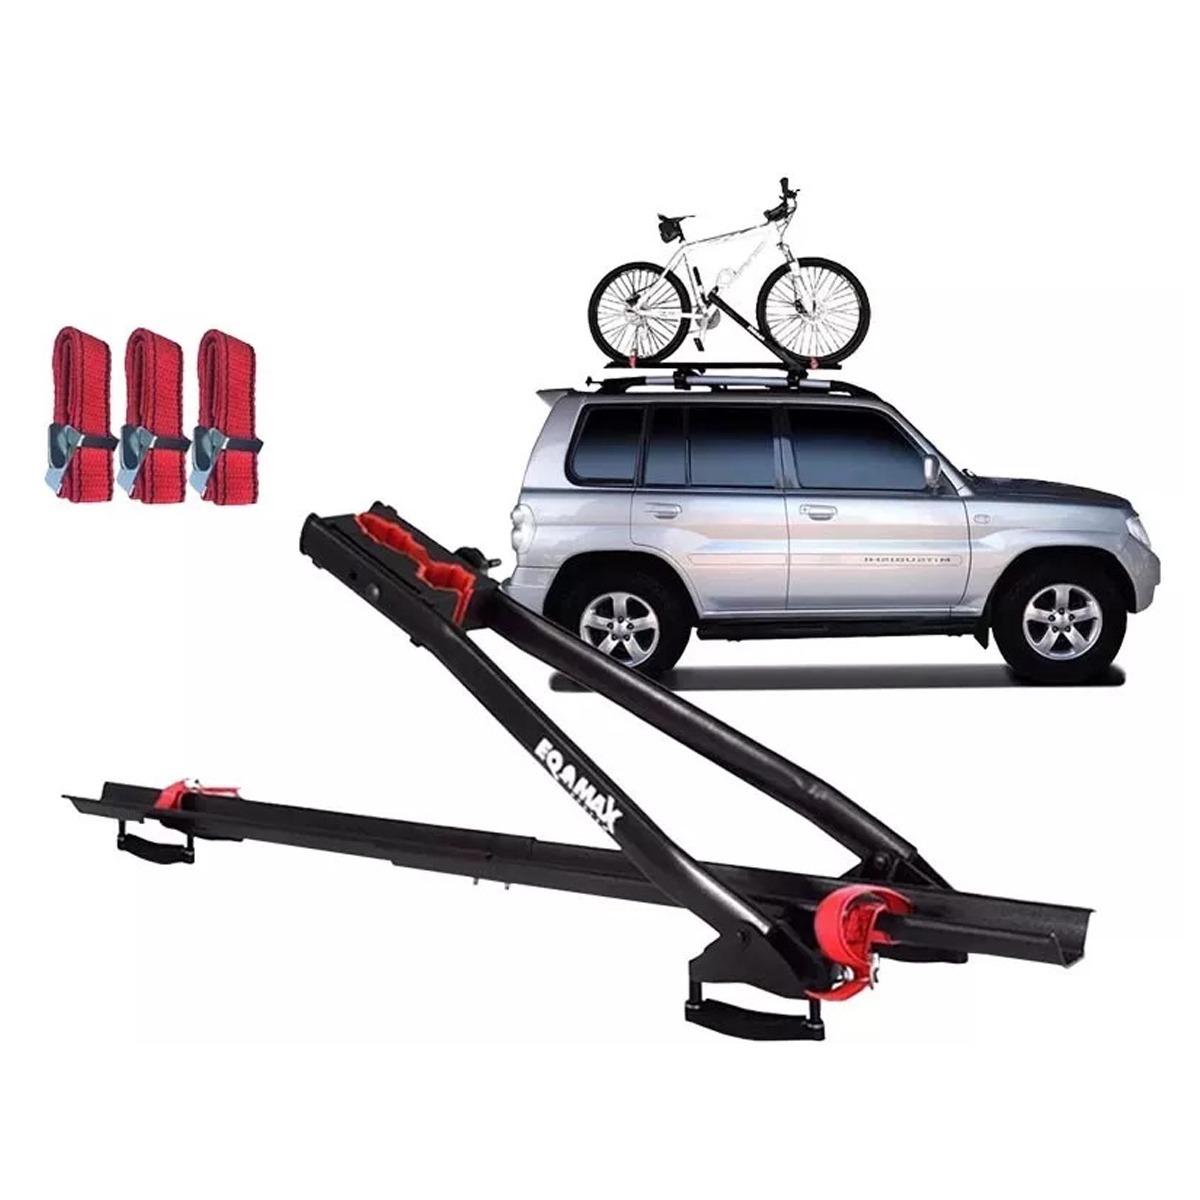 255671a62 suporte de teto para bicicleta transbike eqmax velox 1 bike. Carregando  zoom.